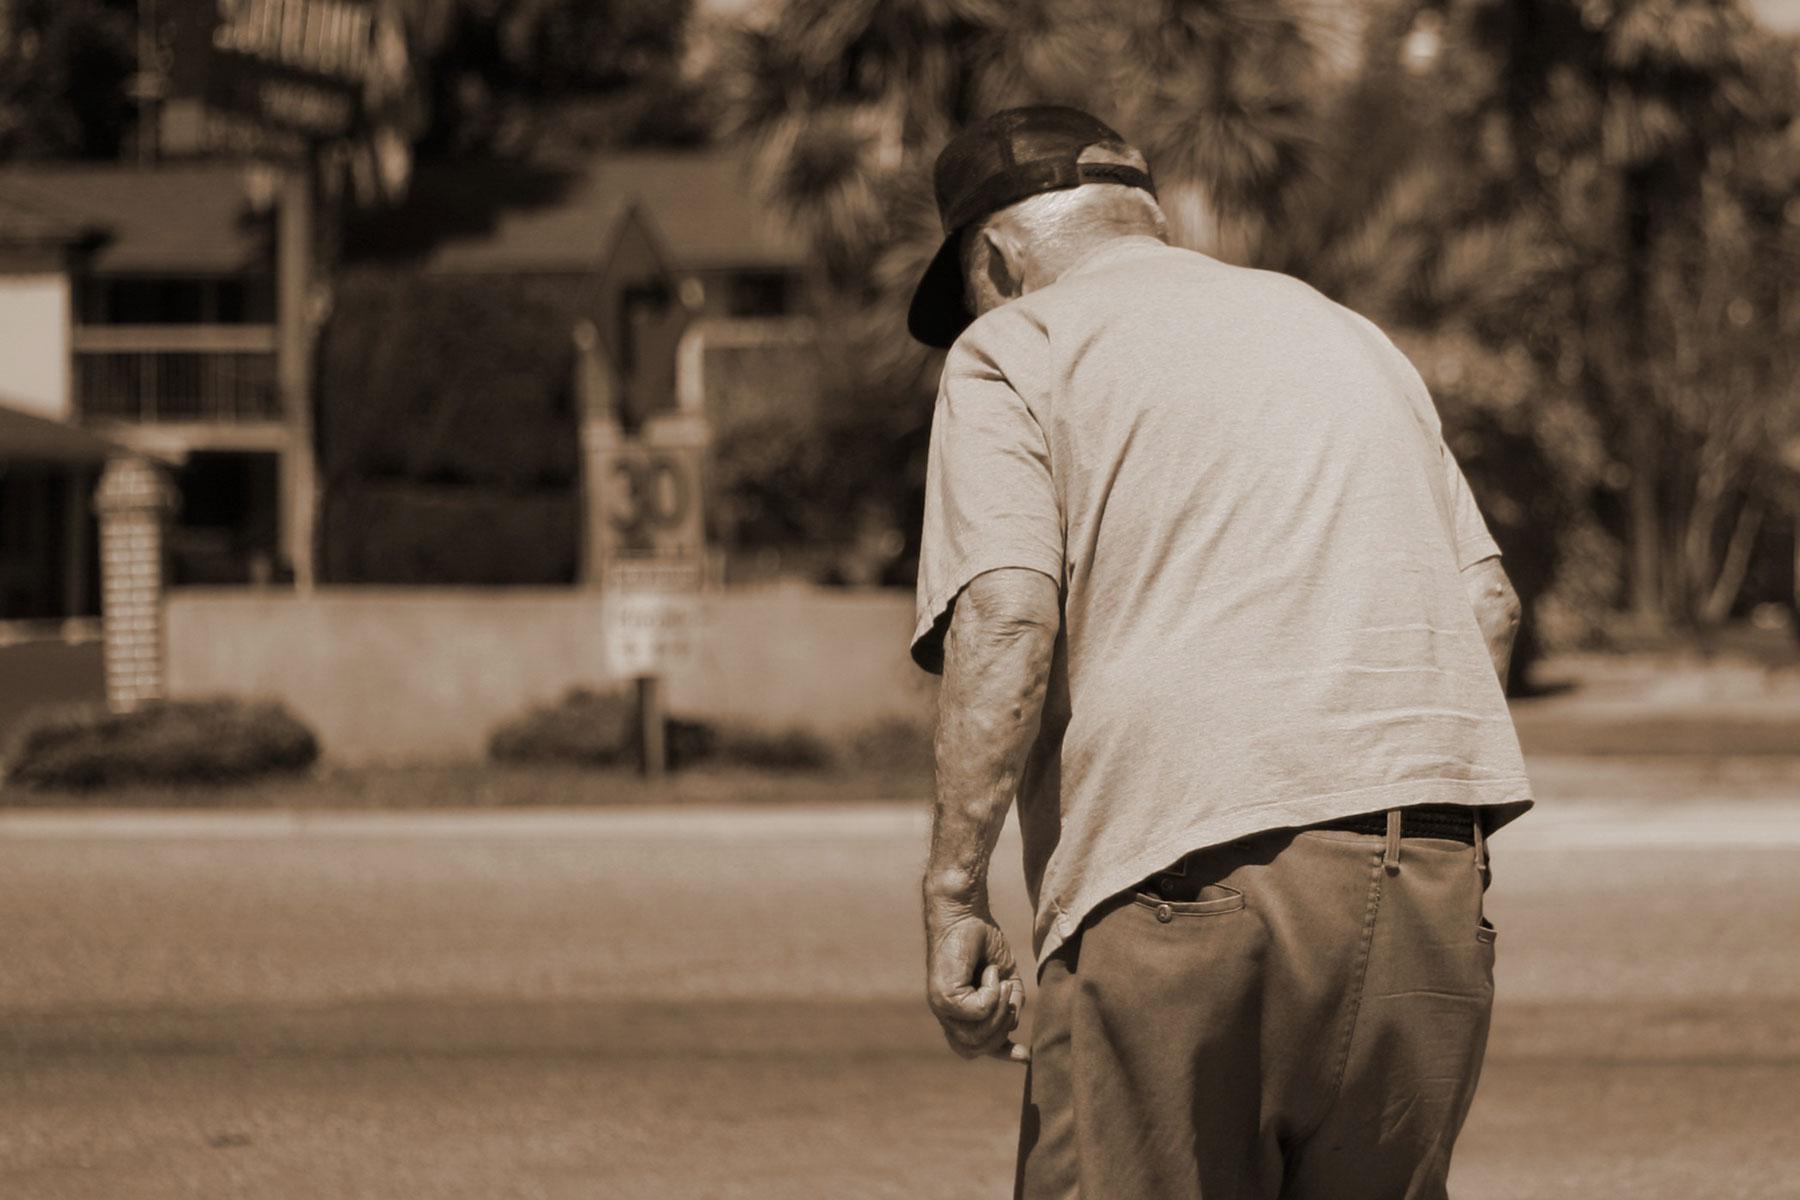 Old man osteoporosis